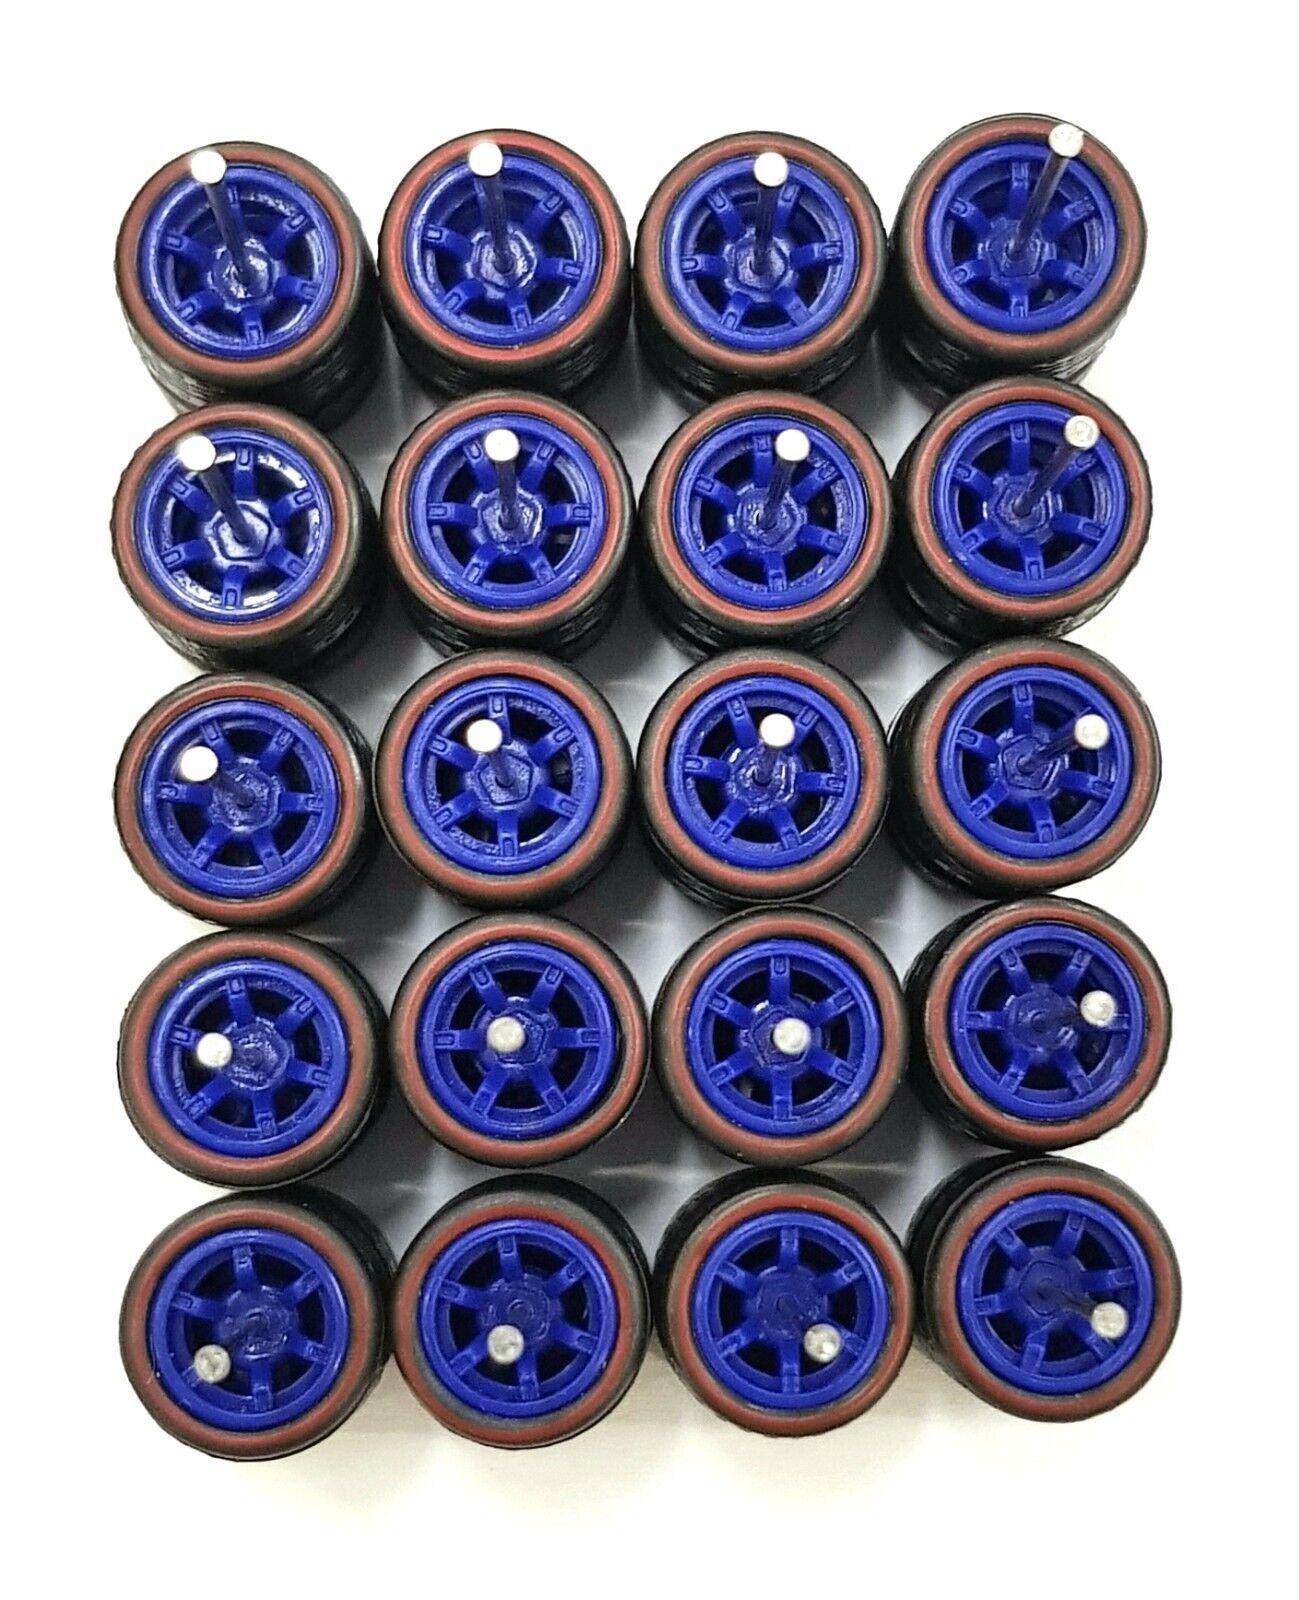 10 sets 6 spoke CM6 6sp bluee Redline Rubber Tires long axle fit 1 64 Hot Wheels